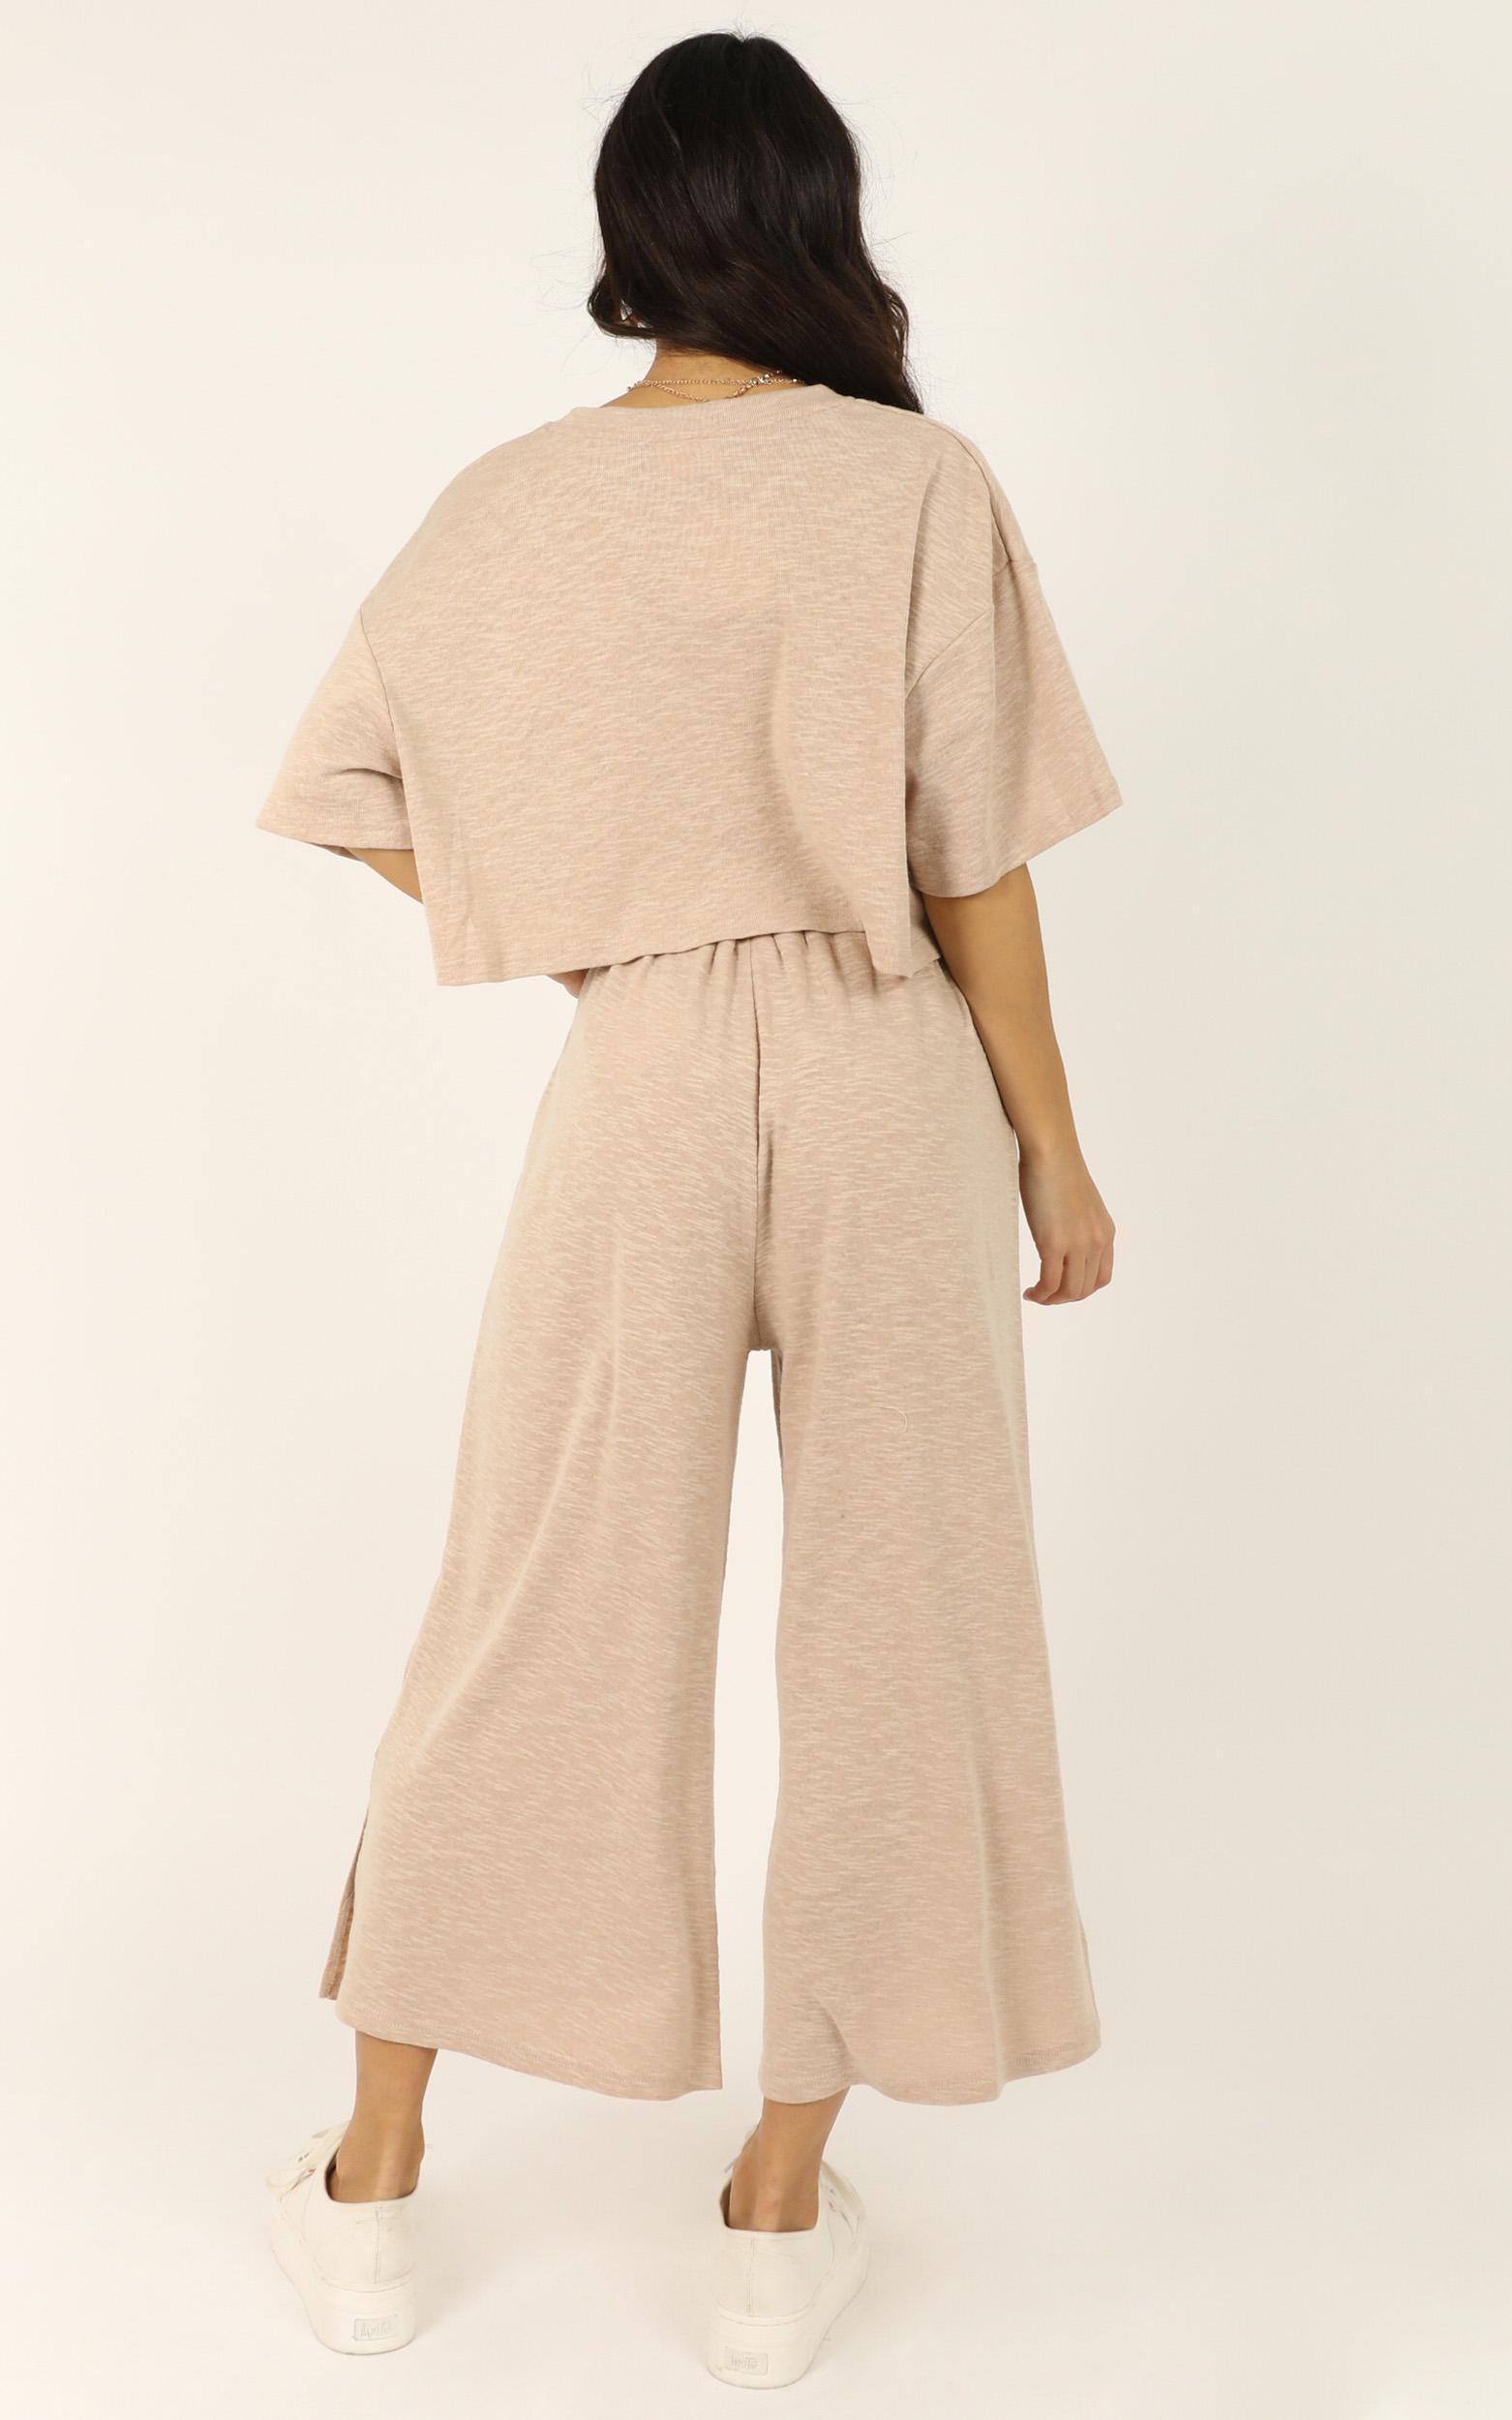 I Got It Bad Pants In cream marle - 10 (M), Cream, hi-res image number null